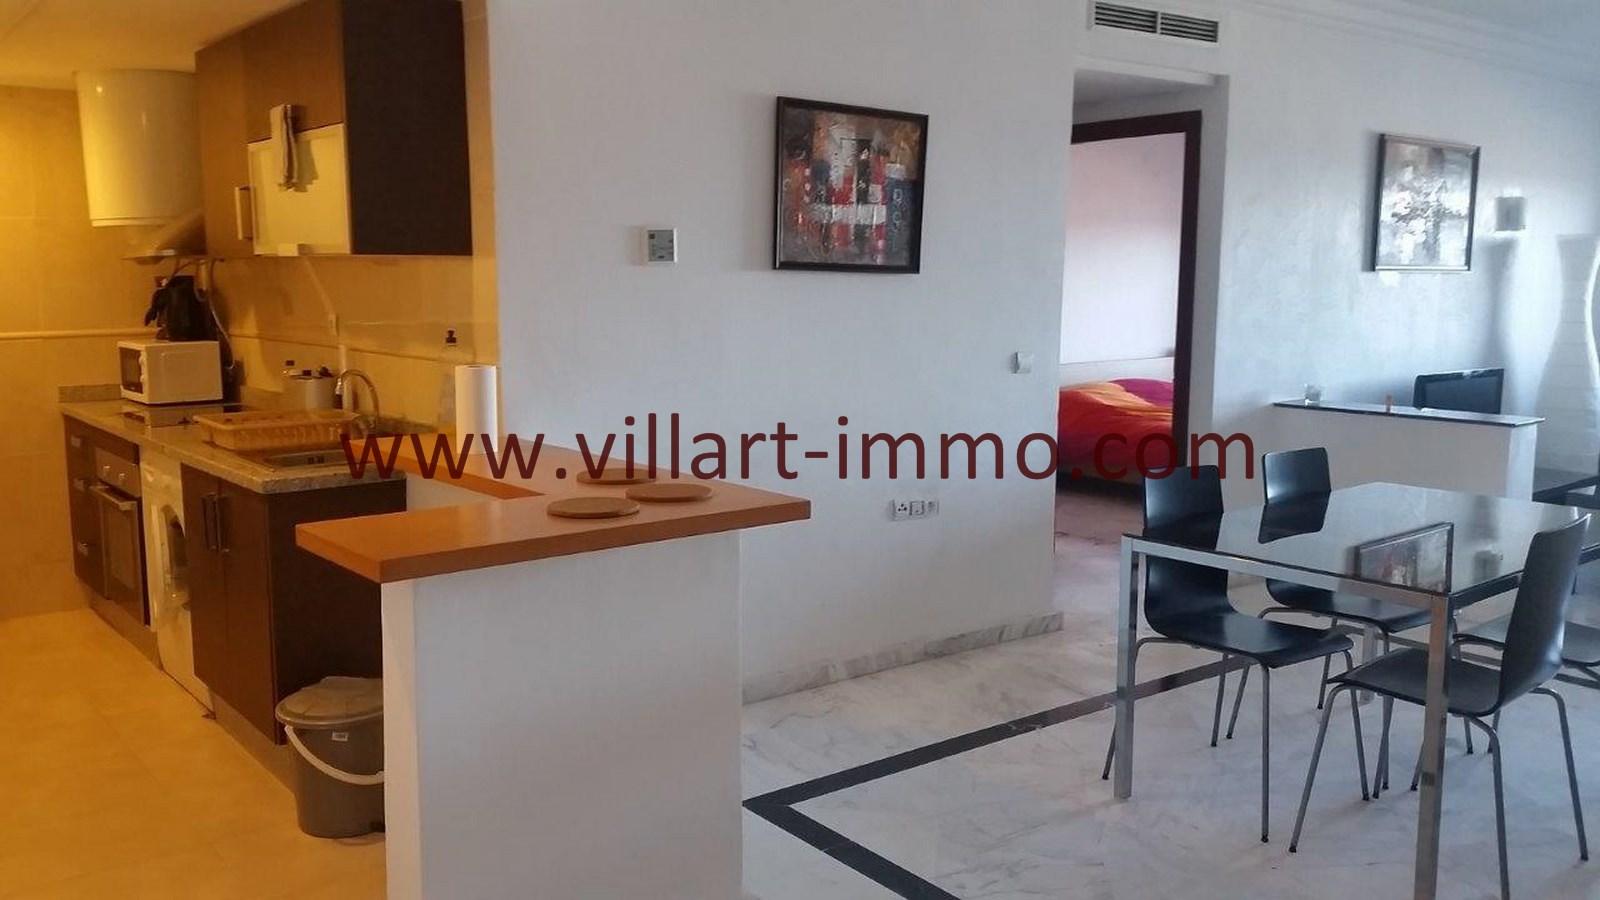 6-Vente-Appartement-Tanger-Centre-De-Ville-Cuisine 1-VA576-Villart Immo